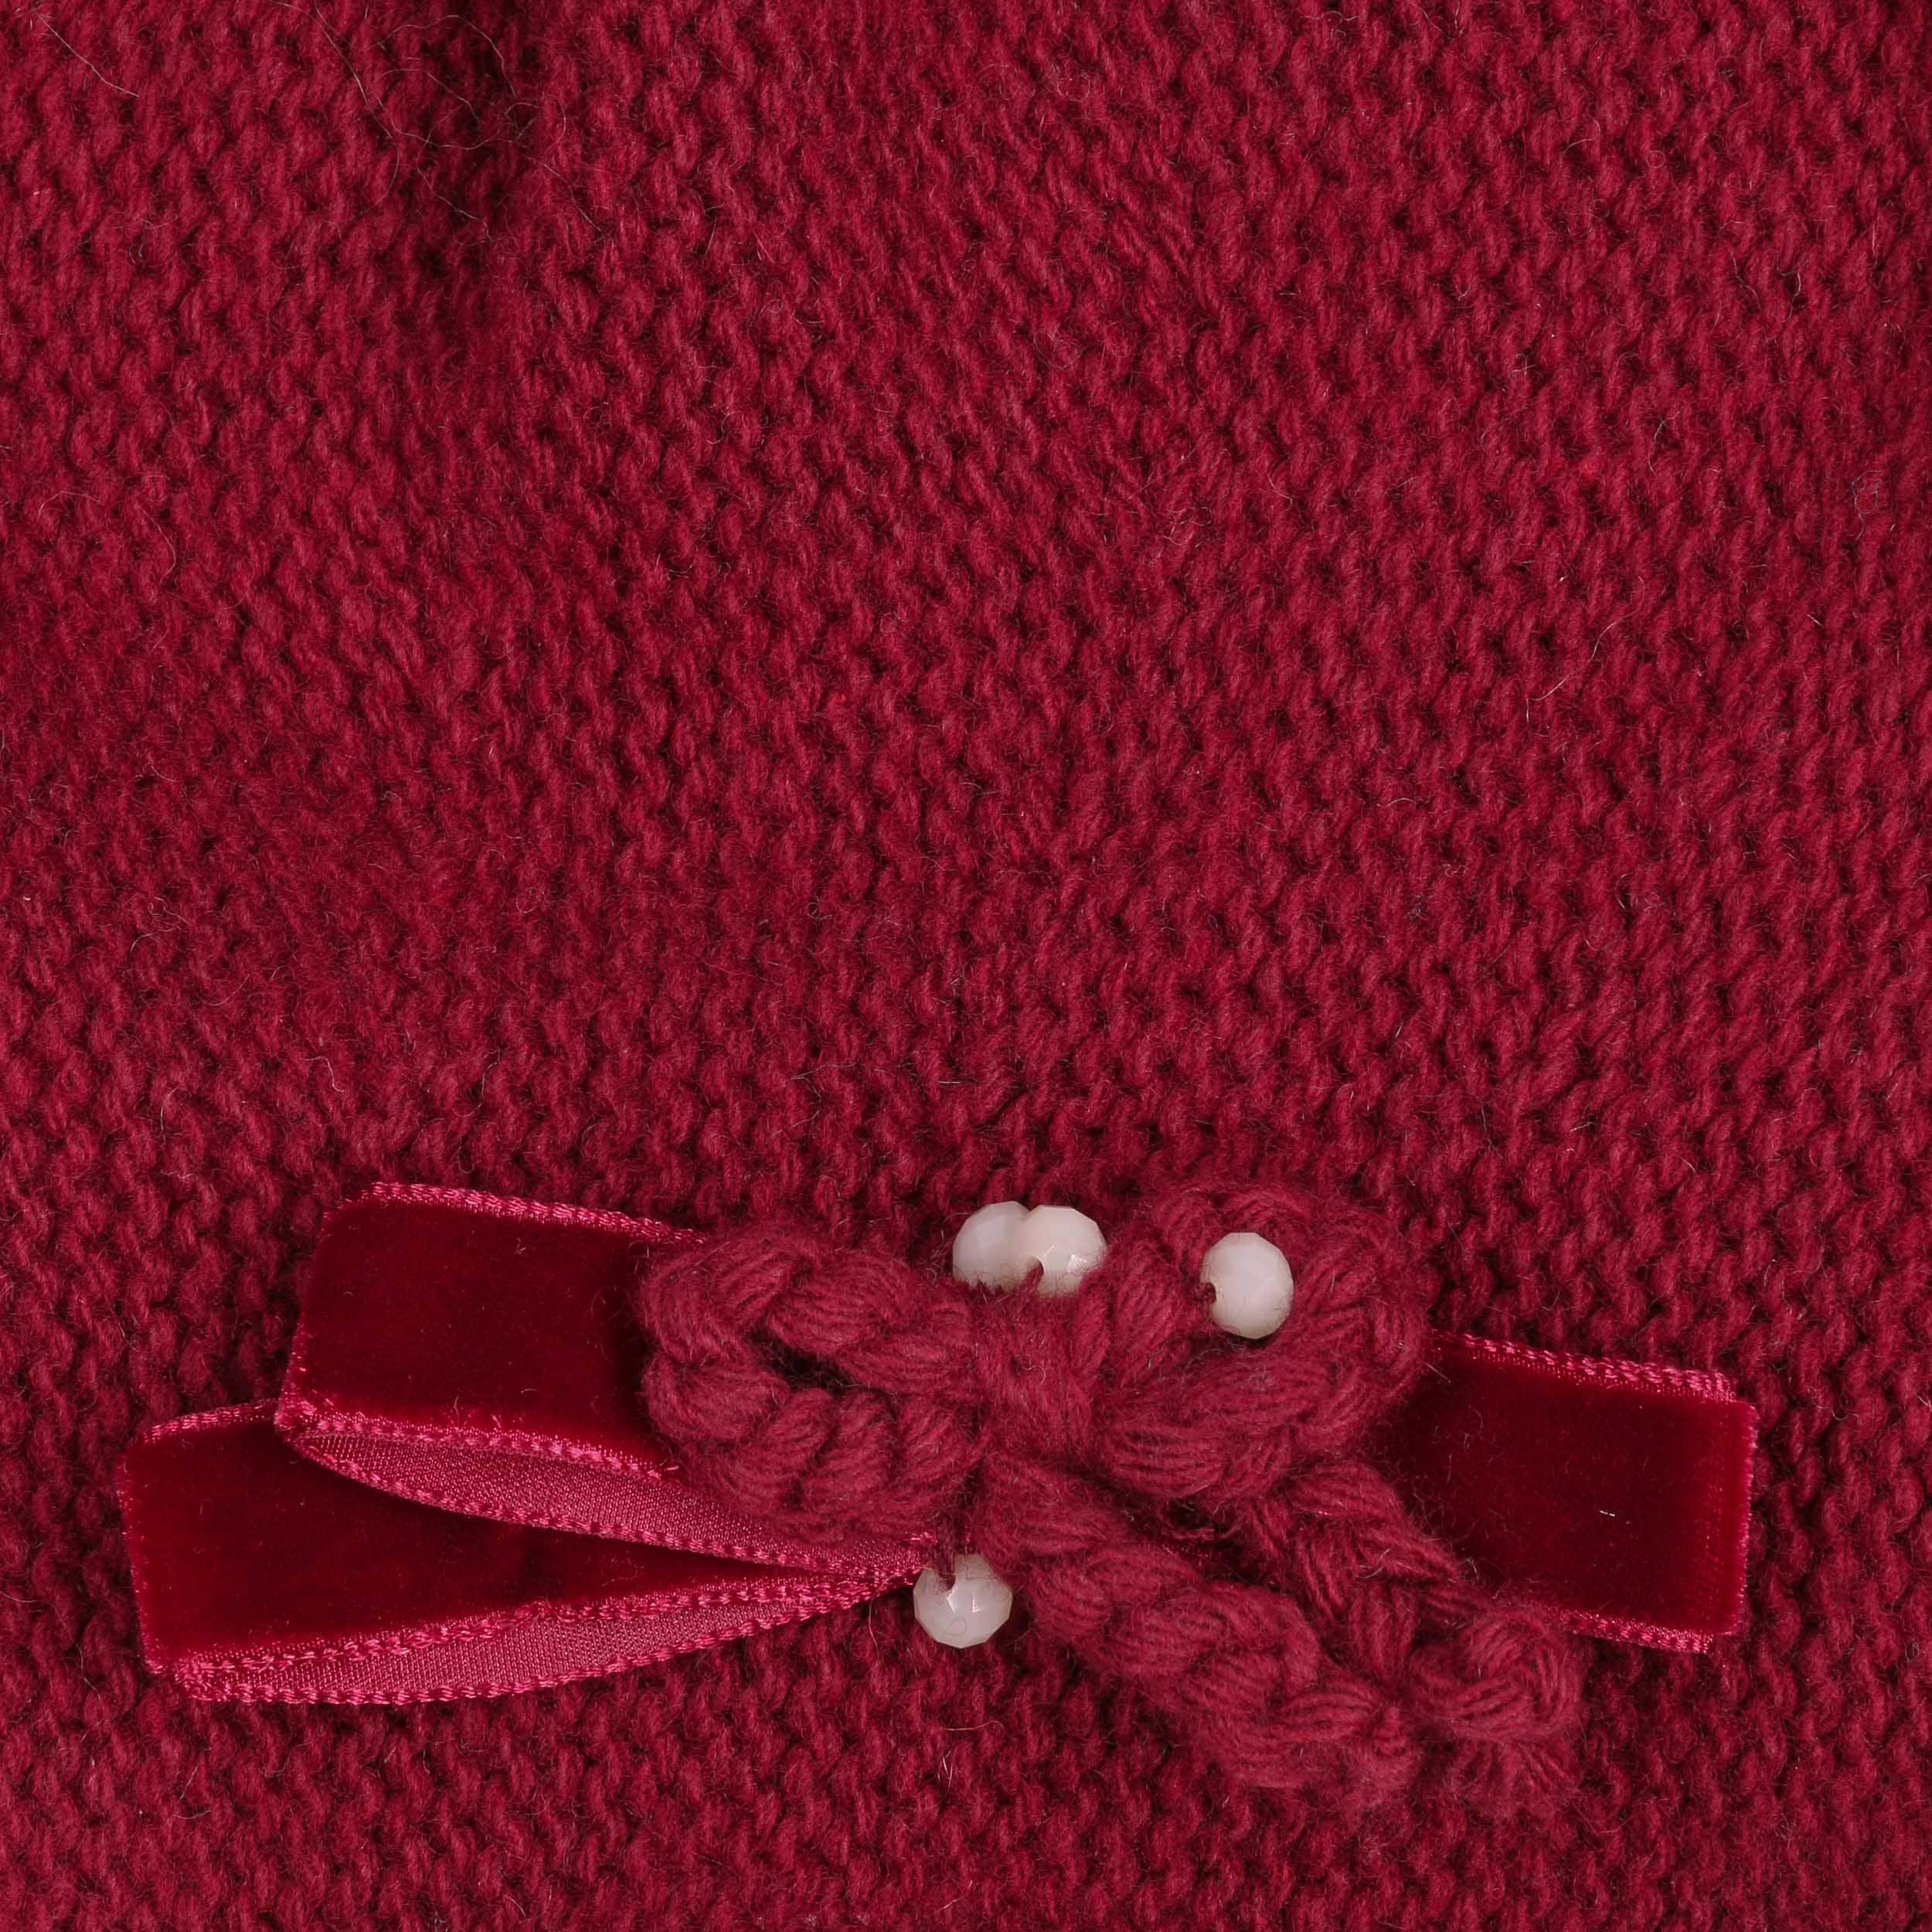 Boina Haran Cashmere by bedacht - Gorros - sombreroshop.es 80ef7ad6815